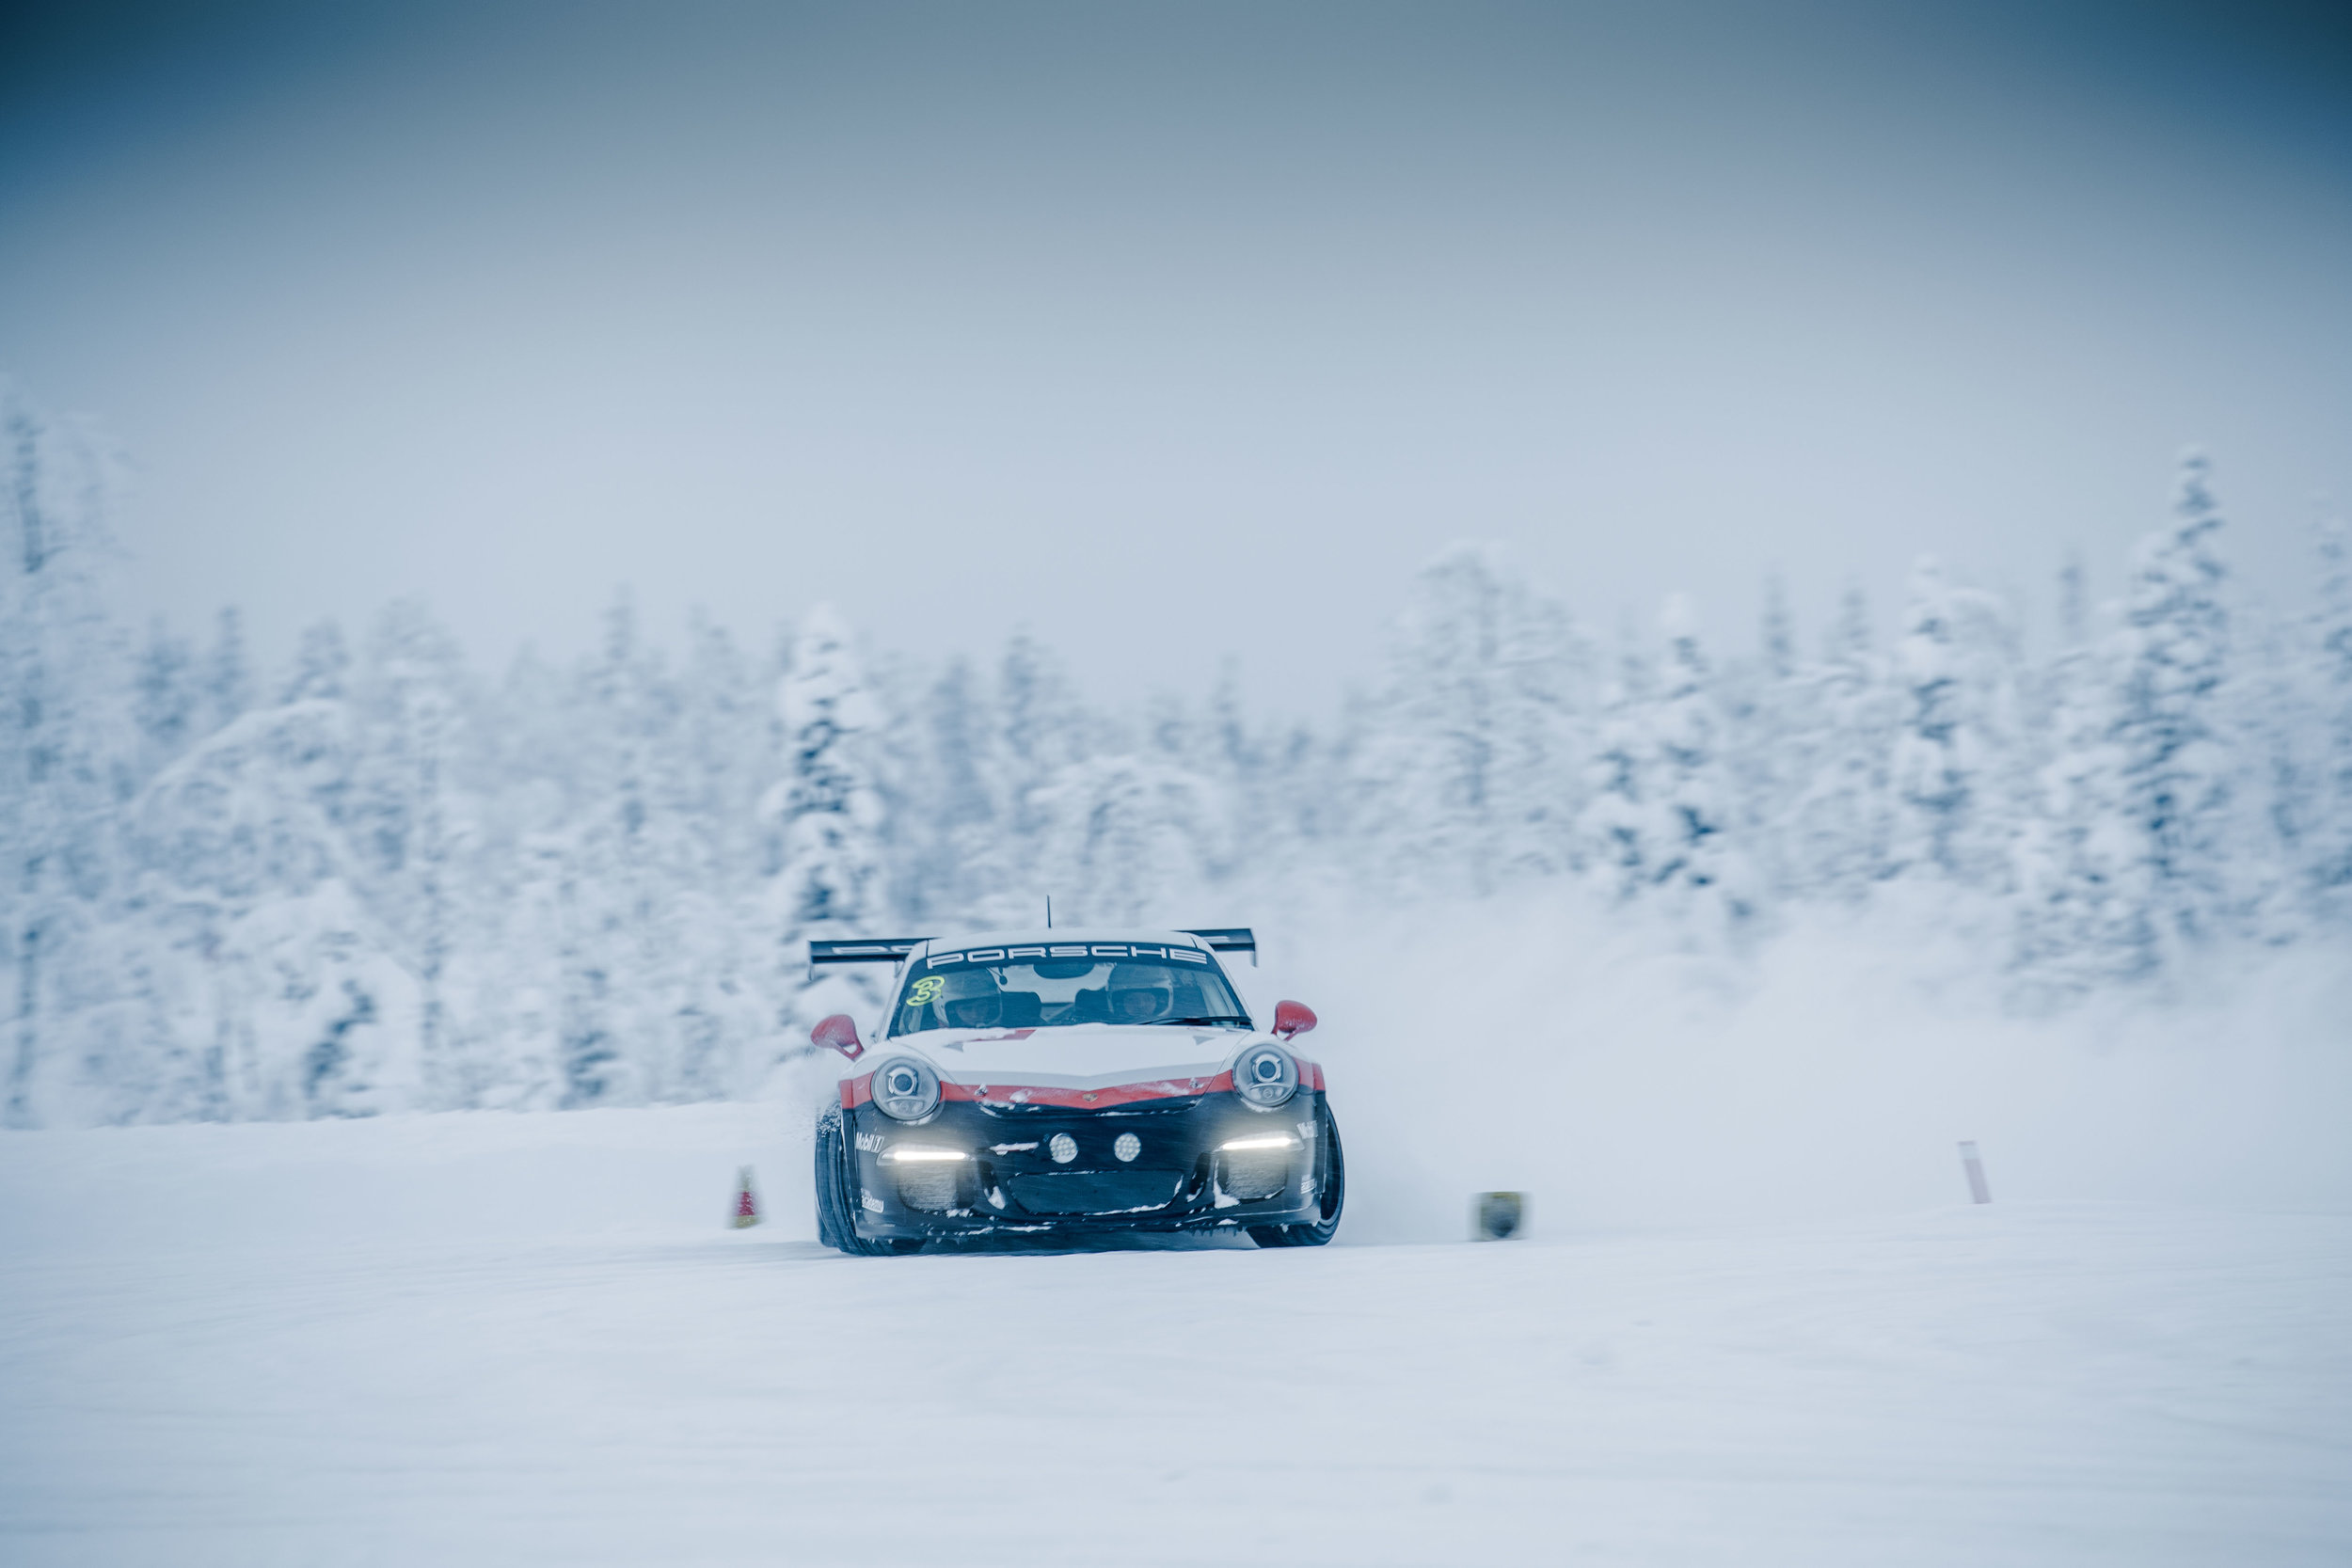 Porsche Ice Experience on Ice_30_01_2019_0392_175670.jpg